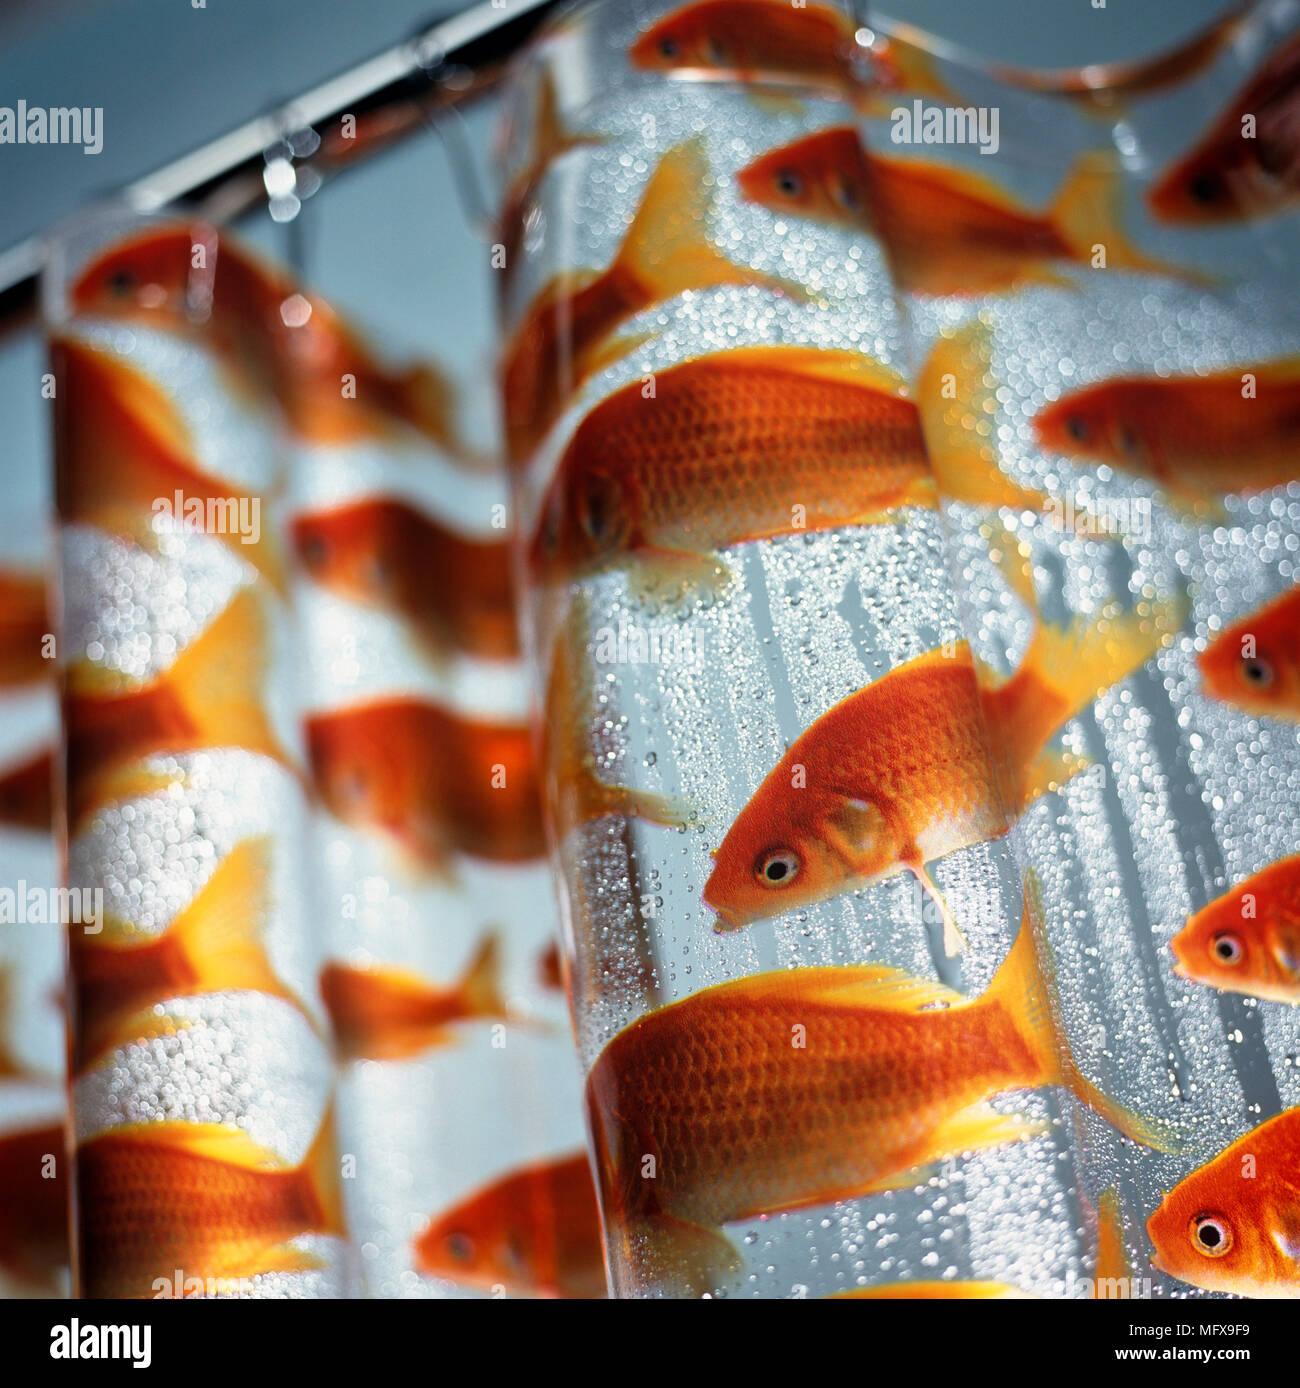 Plastic Shower Curtain With Goldfish Design